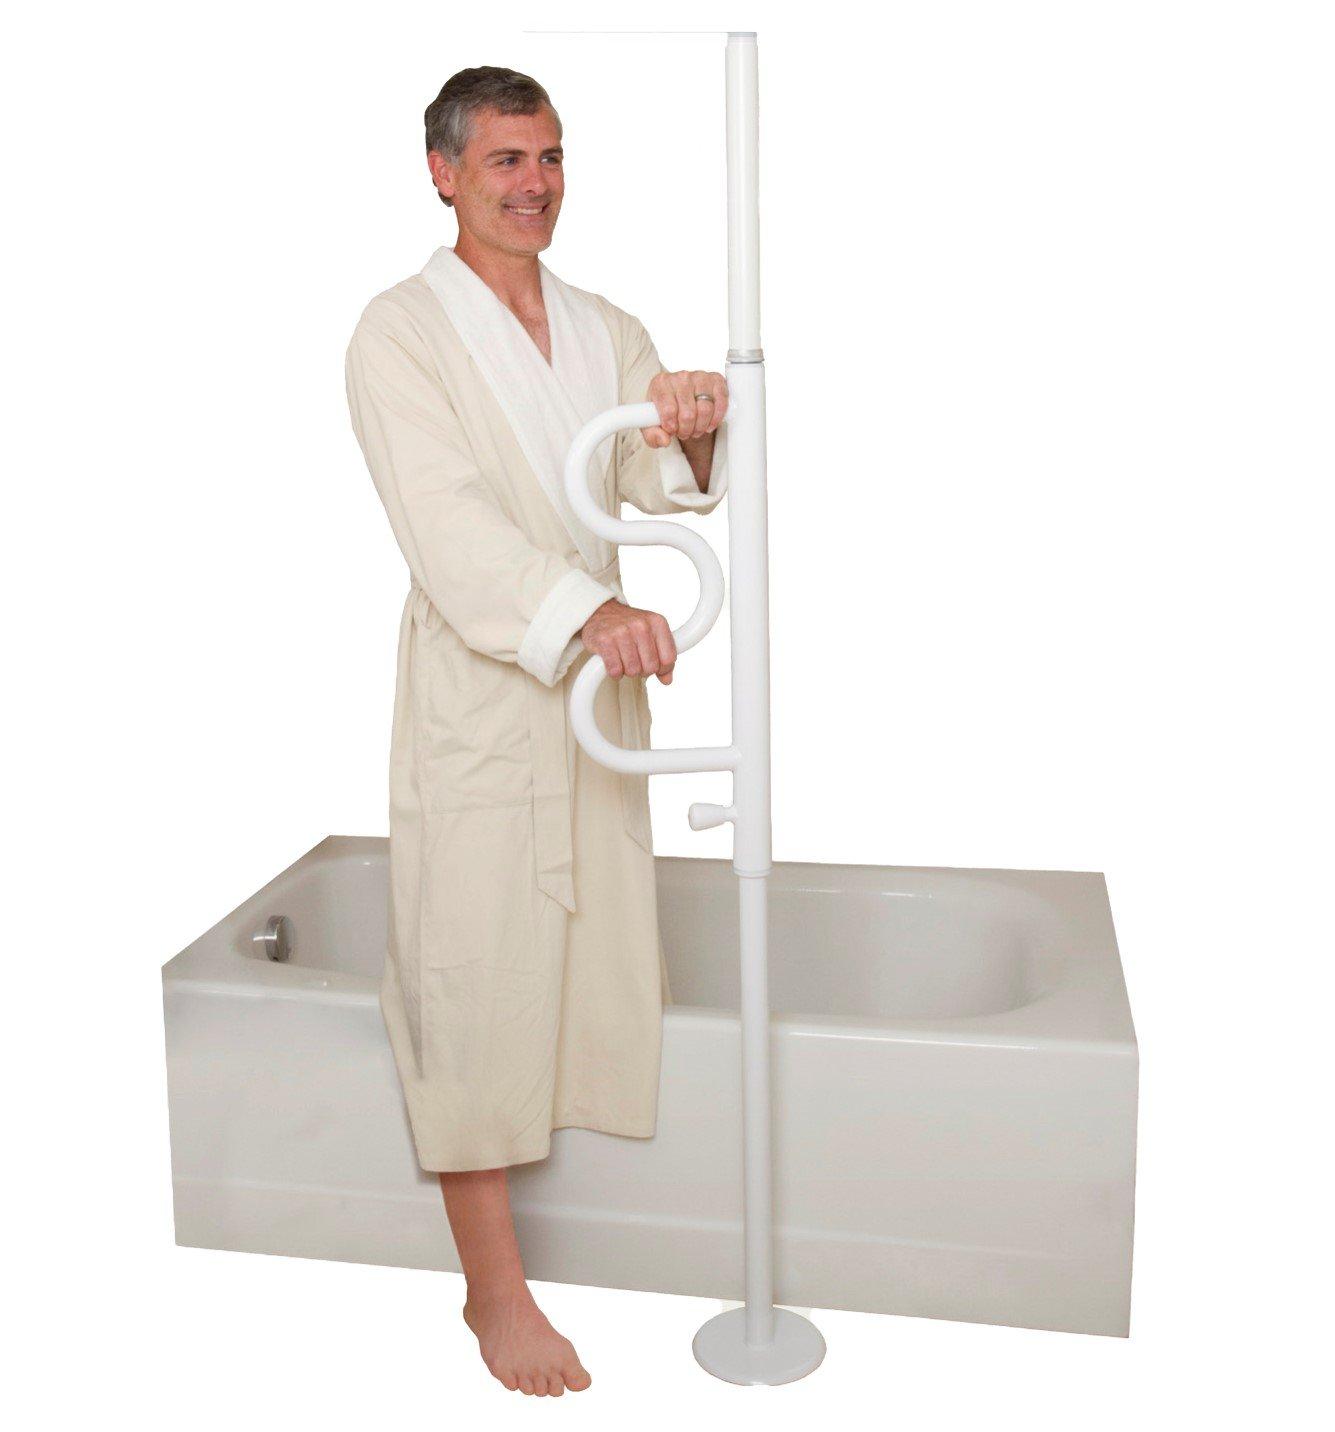 Stander Security Pole & Curve Grab Bar - Elderly Tension Mounted Transfer Pole + Bathroom Assist Grab Bar - Iceberg White by Stander (Image #6)